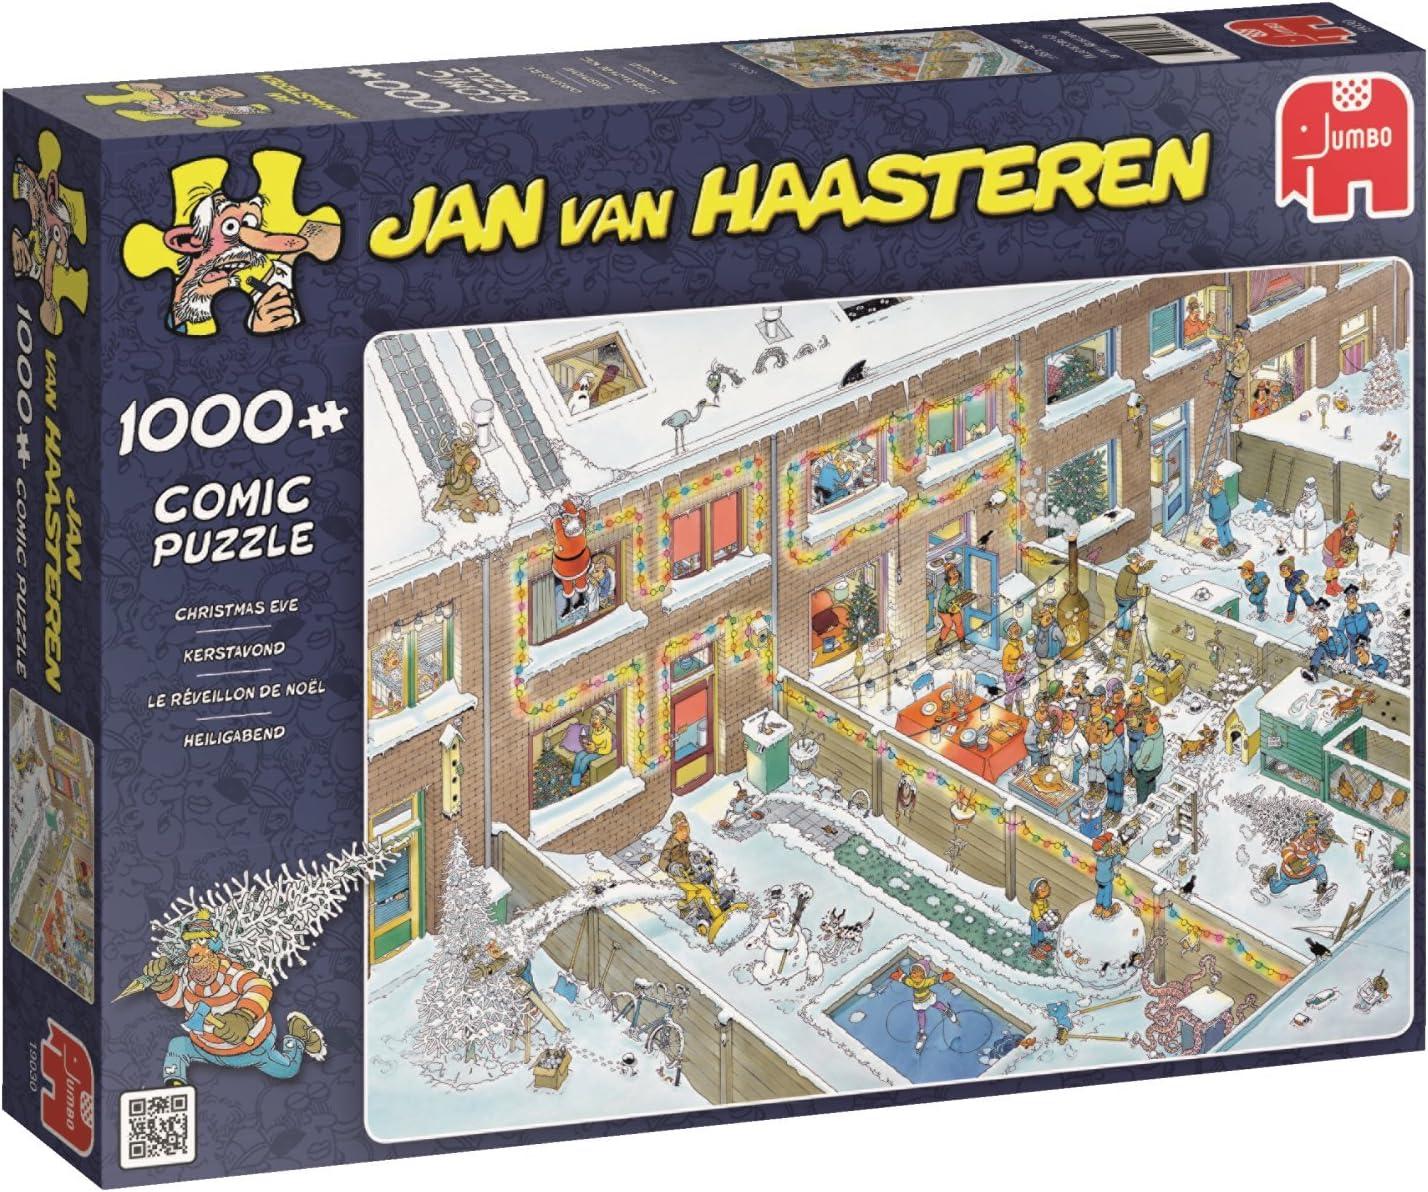 Jumbo Jan Van Haasteren Christmas Eve Jigsaw Puzzle (1000 Piece)